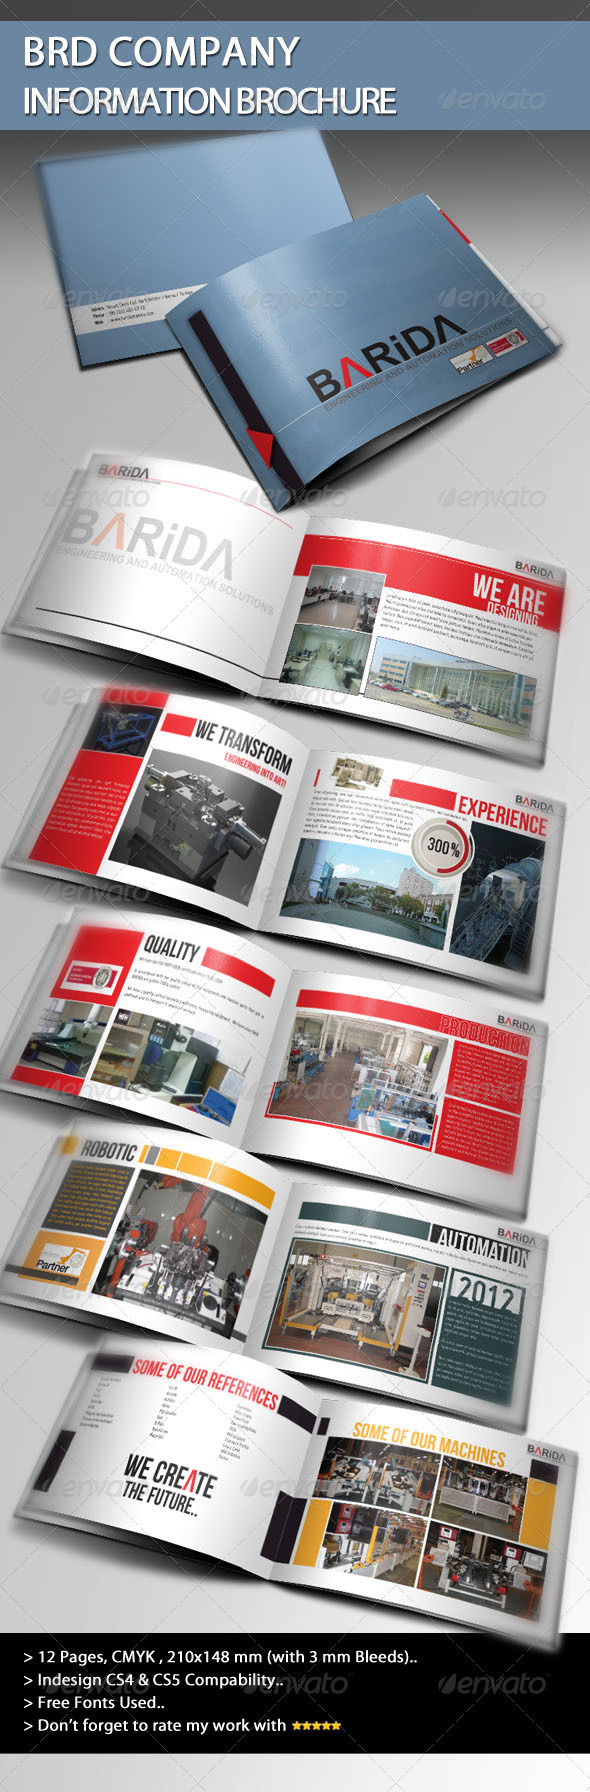 BRD Company Information Brochure - Informational Brochures